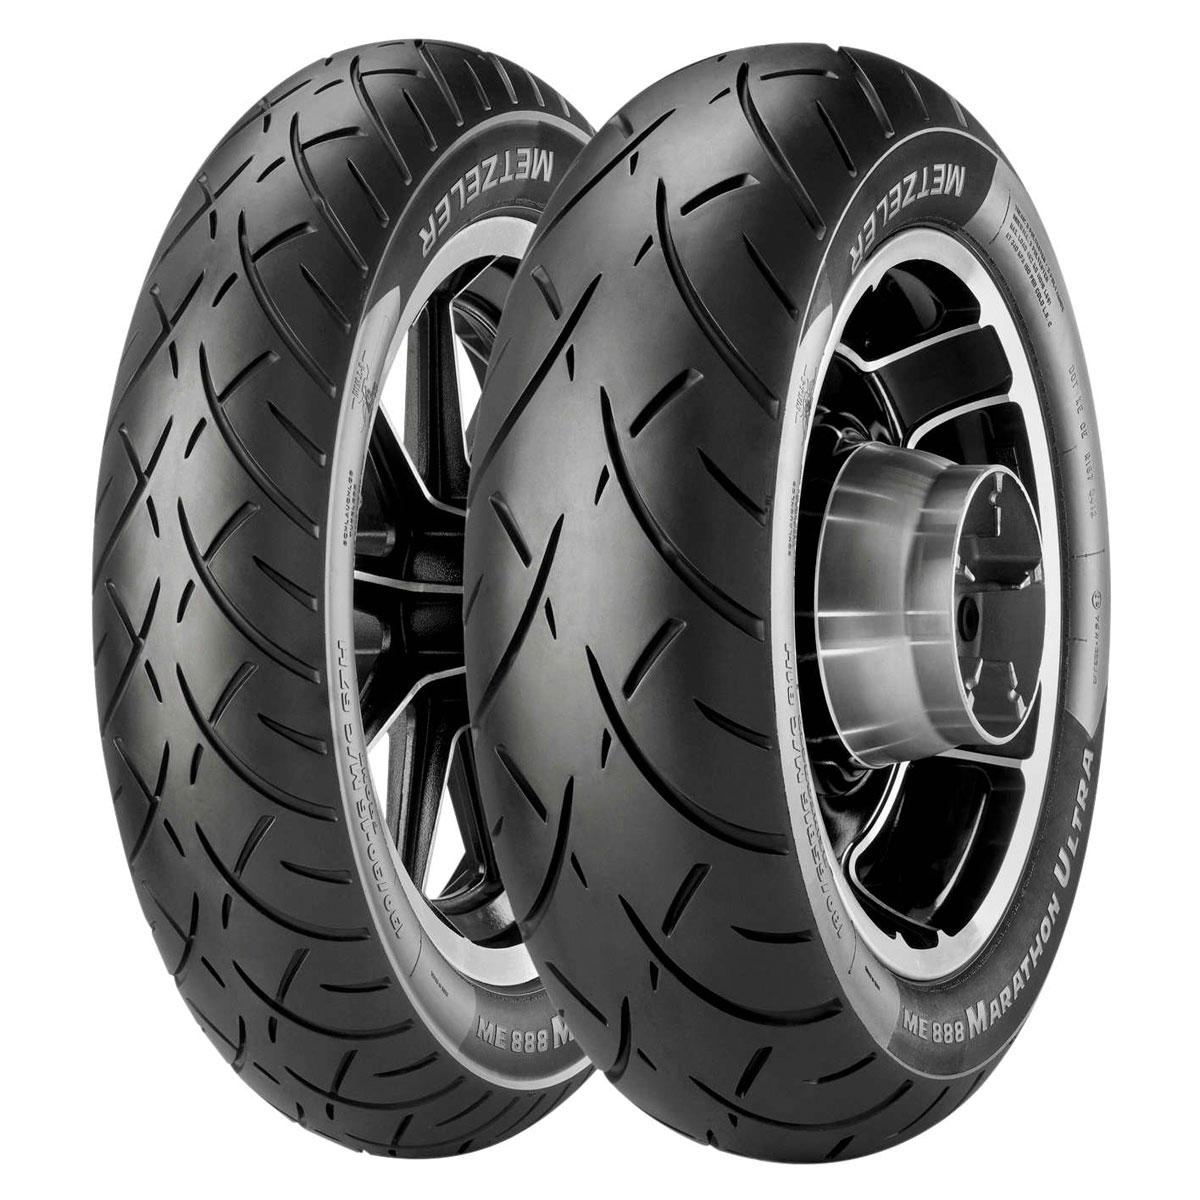 Metzeler ME888 Marathon Ultra 260/40VR18 Rear Tire